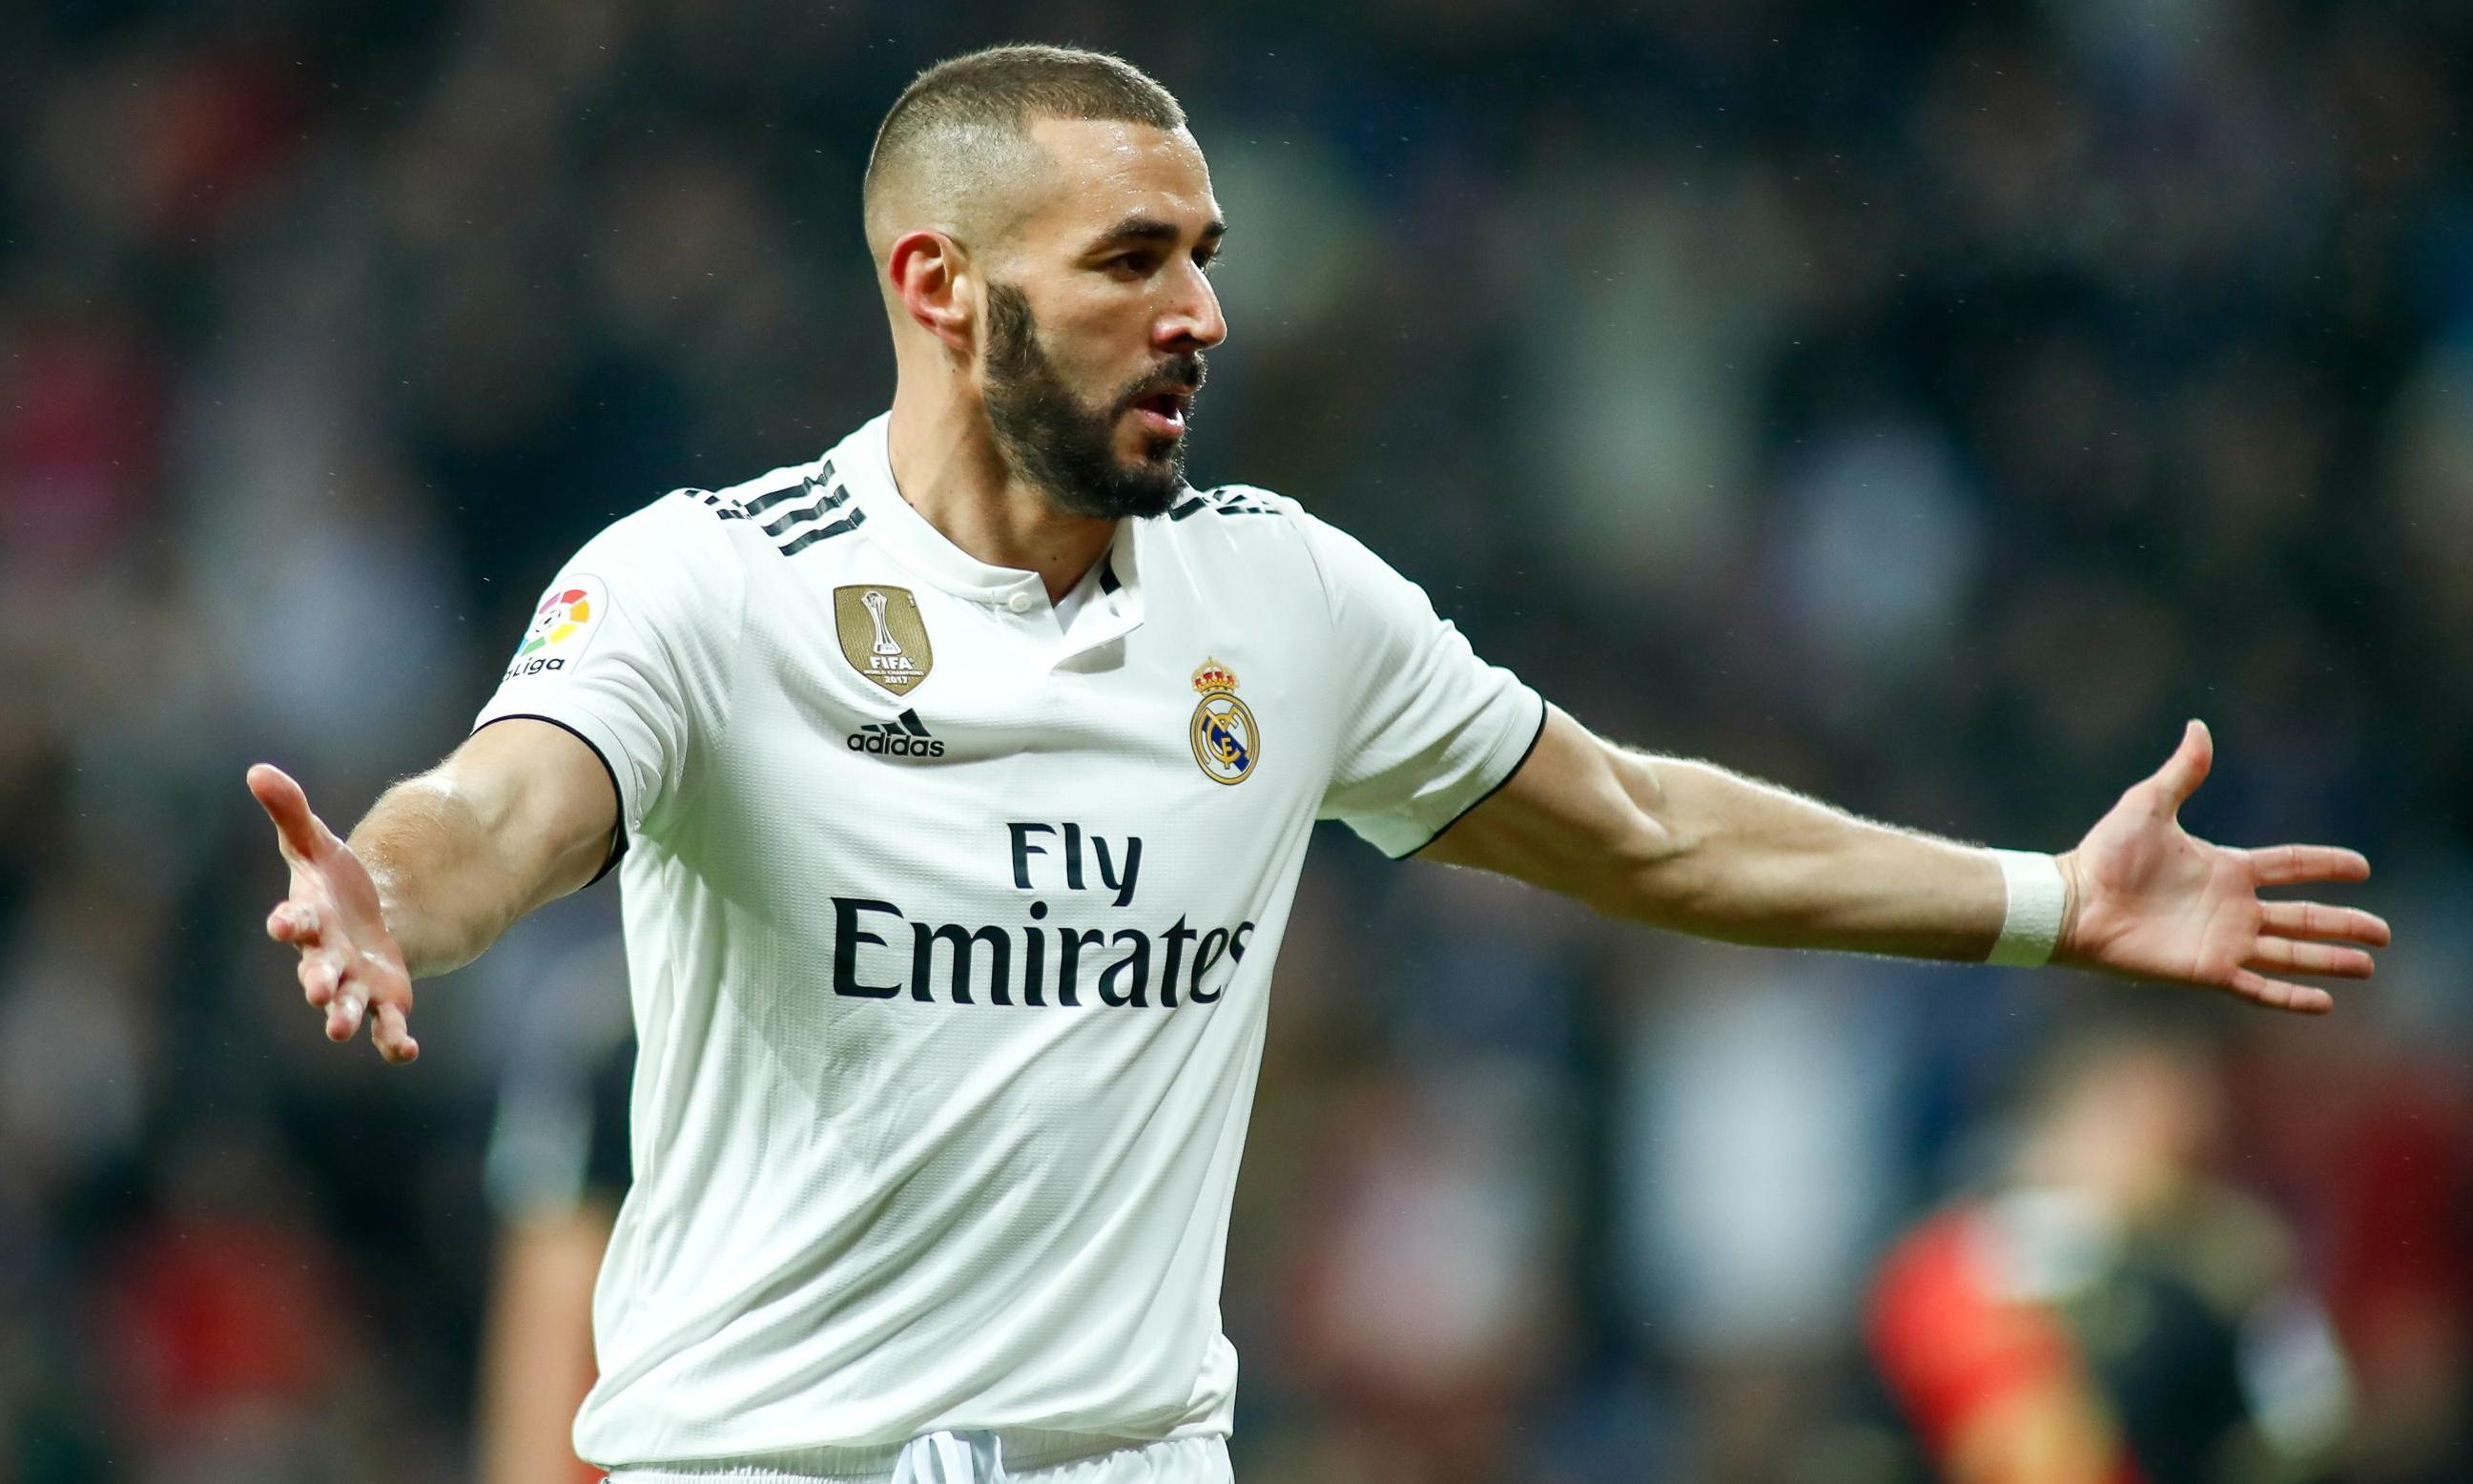 European roundup: Real win amid boos, while Ronaldo seals derby for Juventus